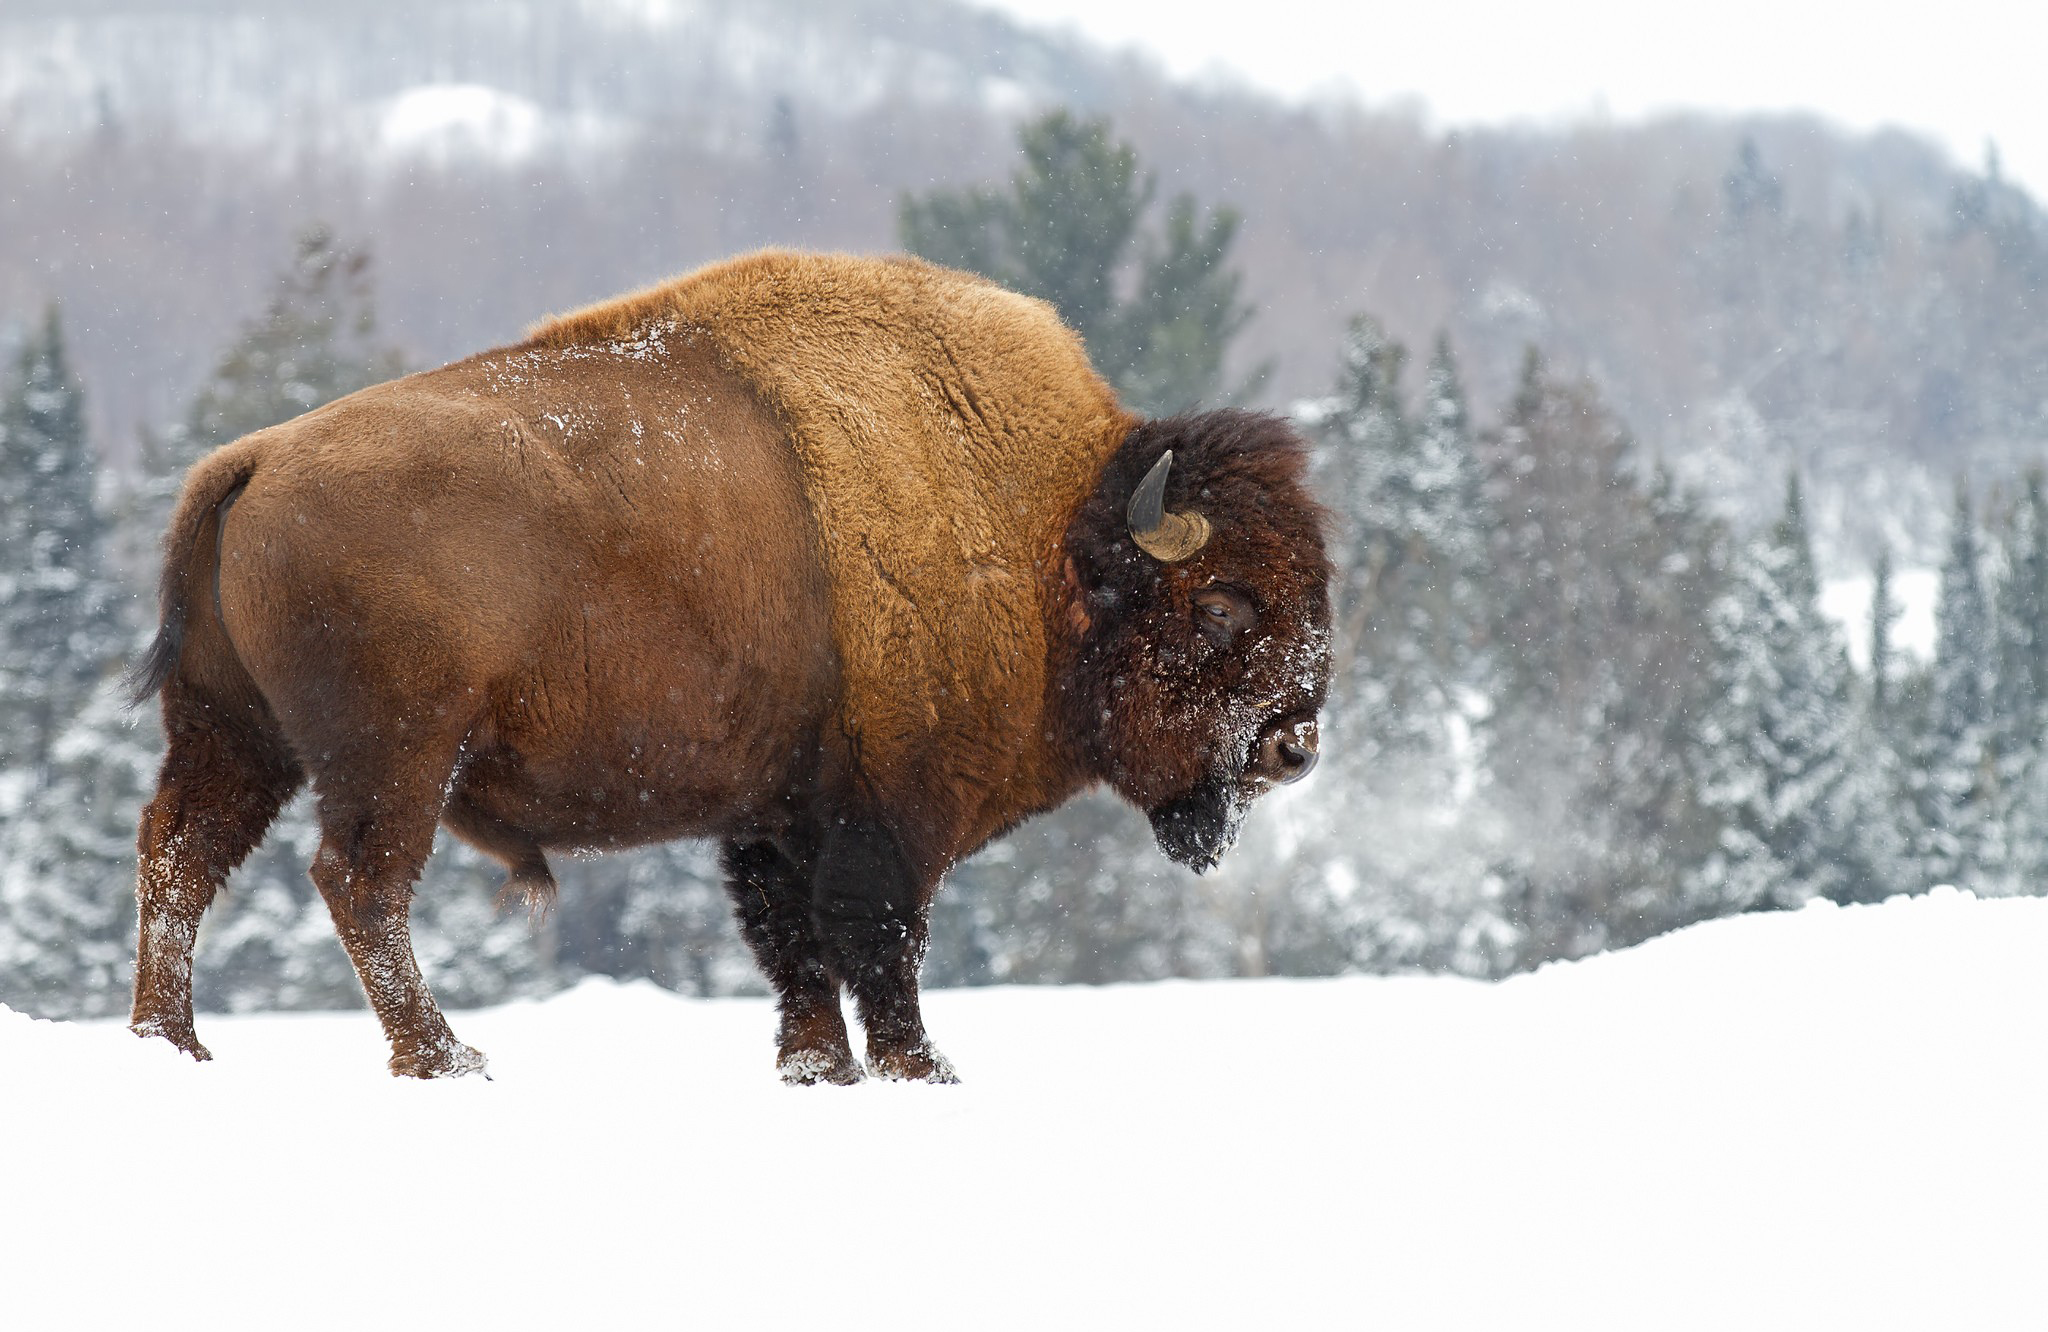 [46+] American Bison Wallpaper on WallpaperSafari